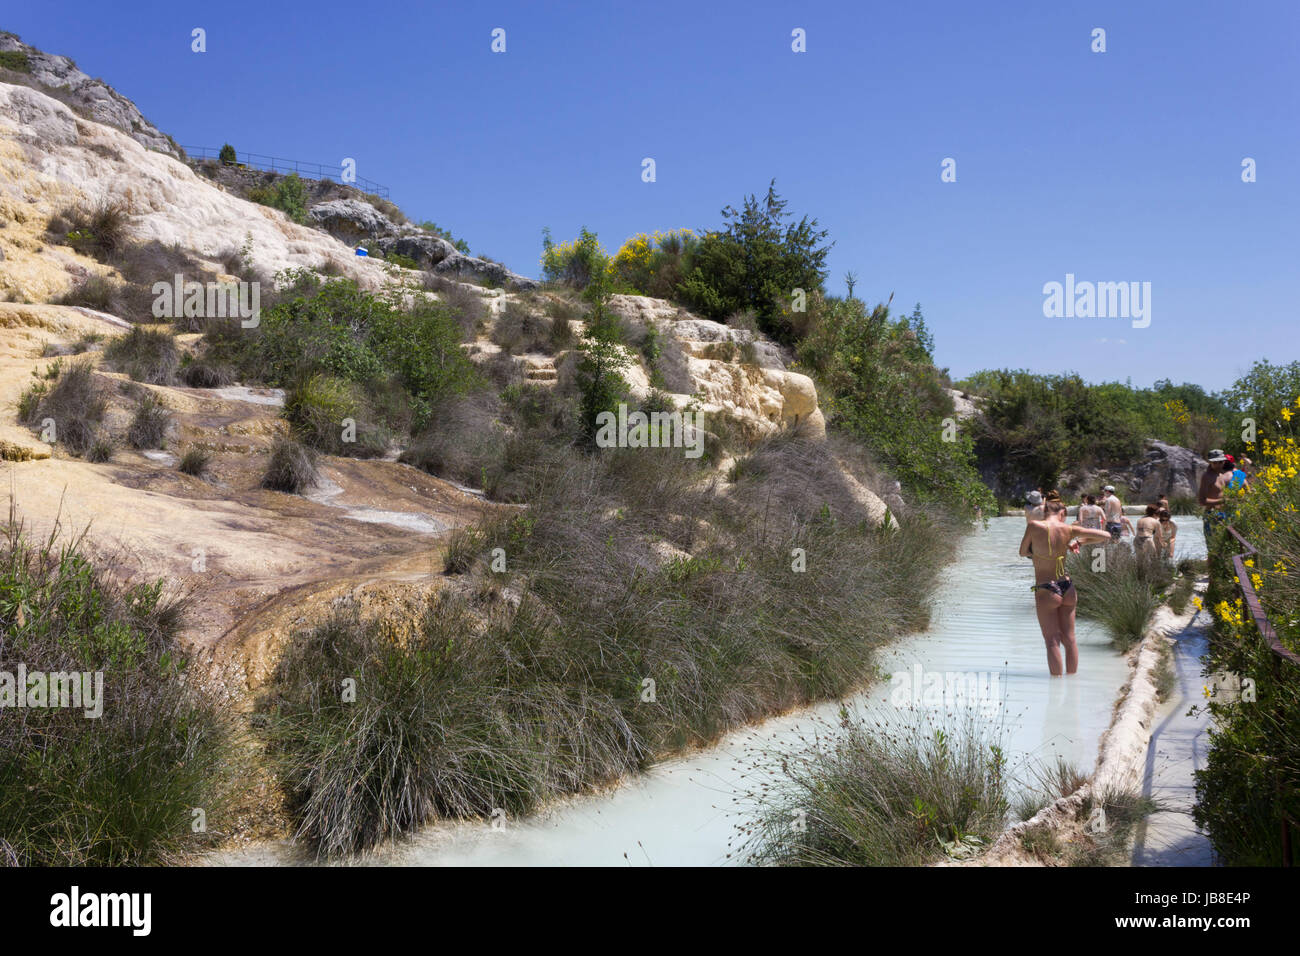 BAGNI VIGNONE, ITALY - JUNE 3 2017: The scenic hot spring pool of ...